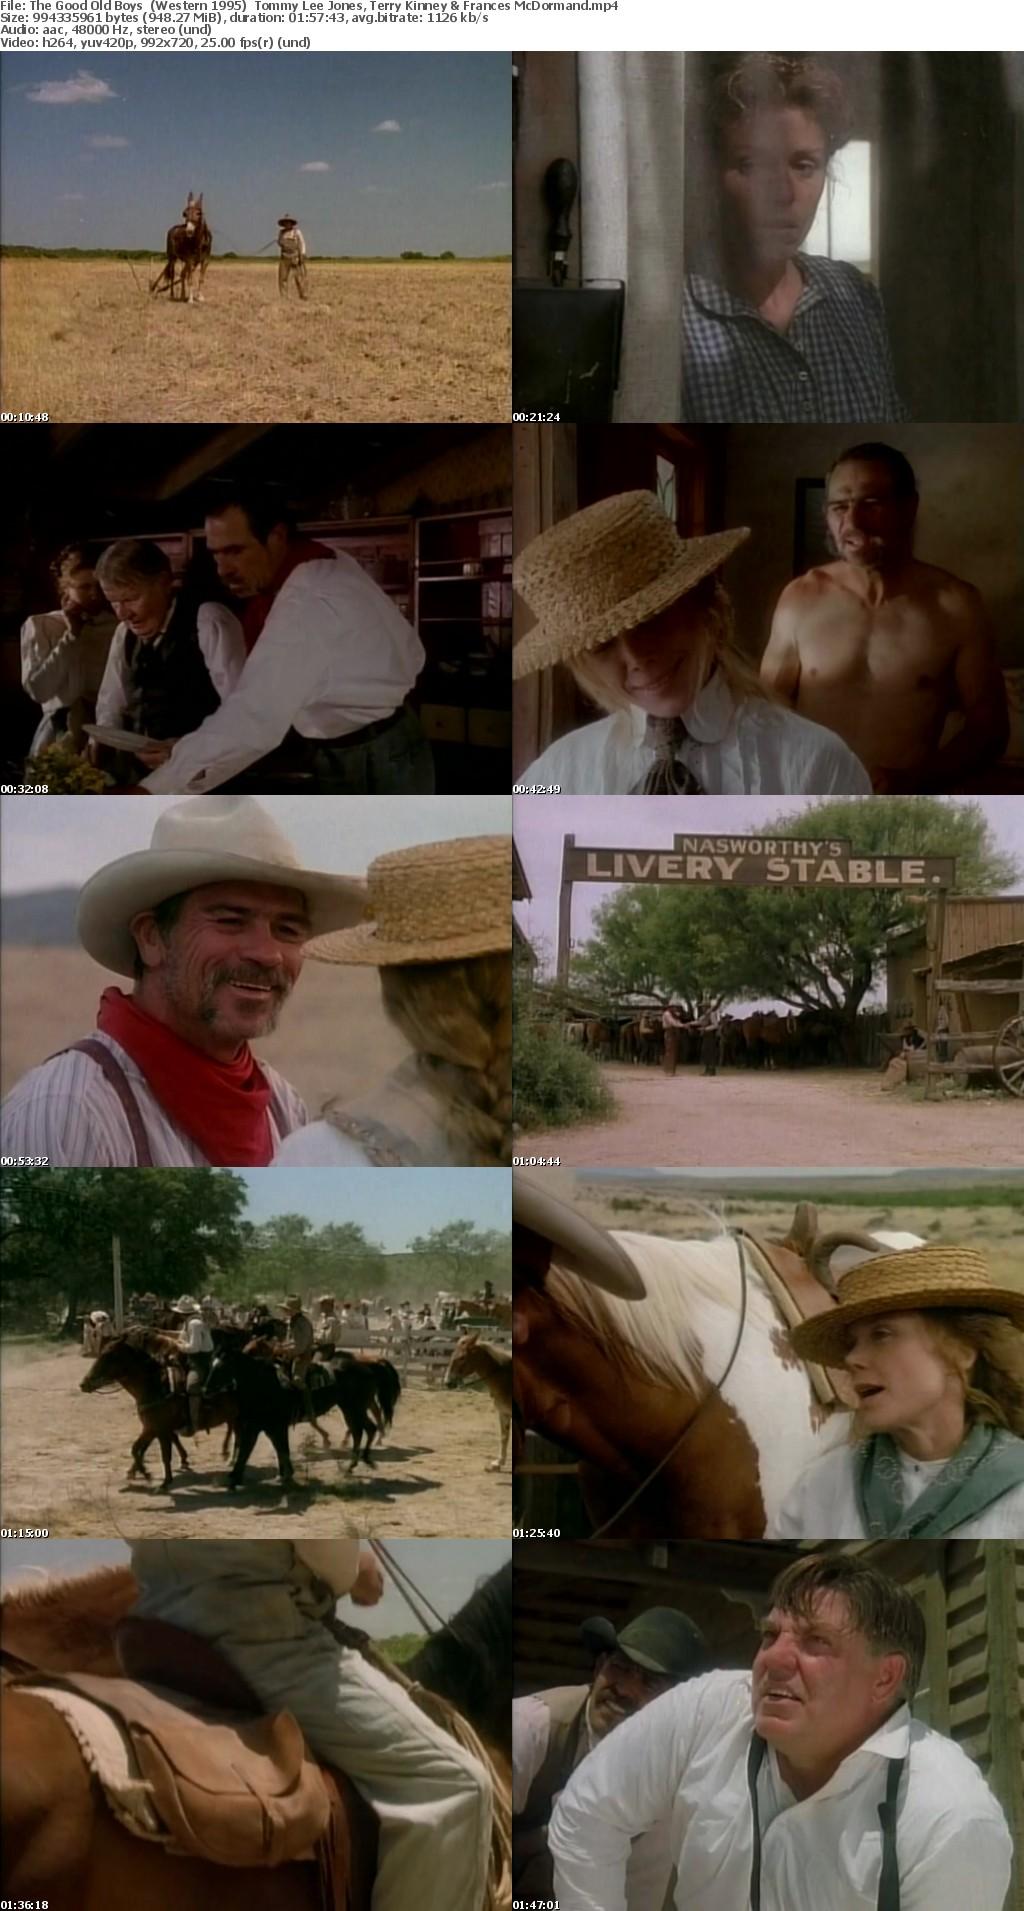 The Good Old Boys (Western 1995) Tommy Lee Jones 720p